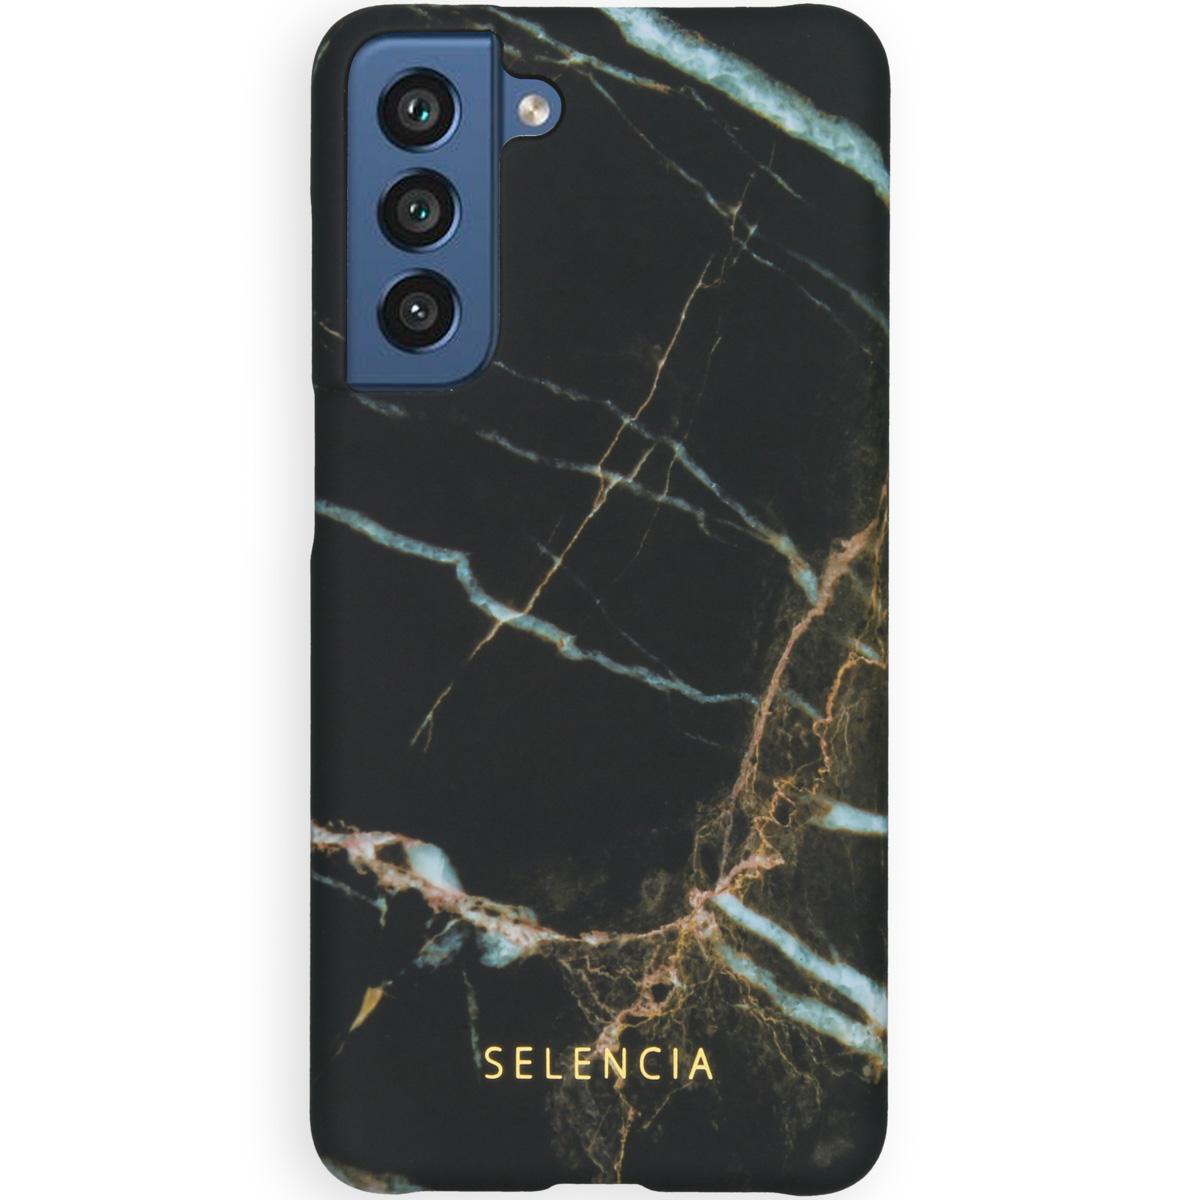 Selencia Maya Fashion Backcover Samsung Galaxy S21 FE - Marble Black